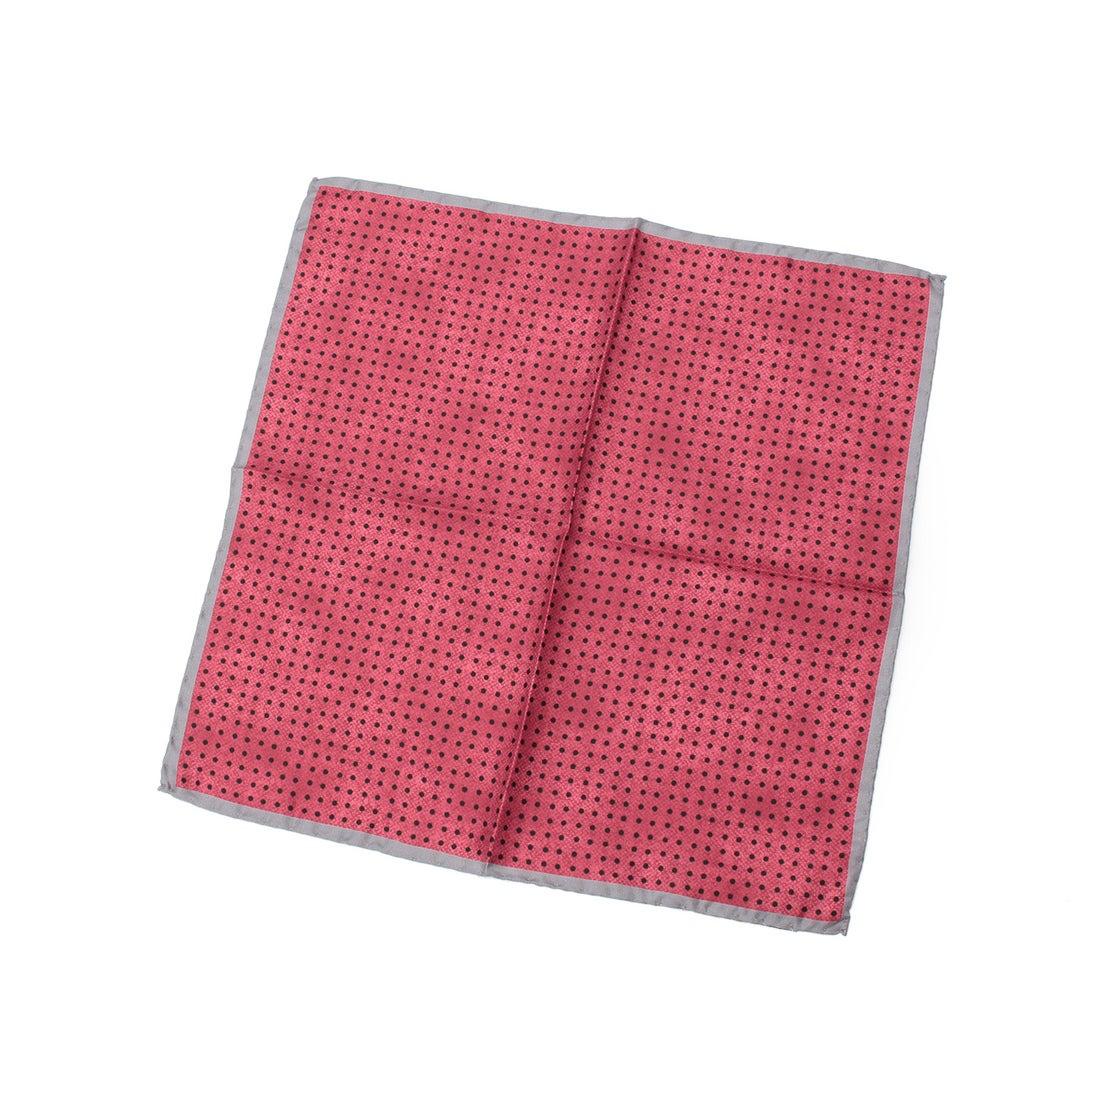 【SALE 60%OFF】タケオ キクチ TAKEO KIKUCHI ドットプリントチーフ (ピンク)